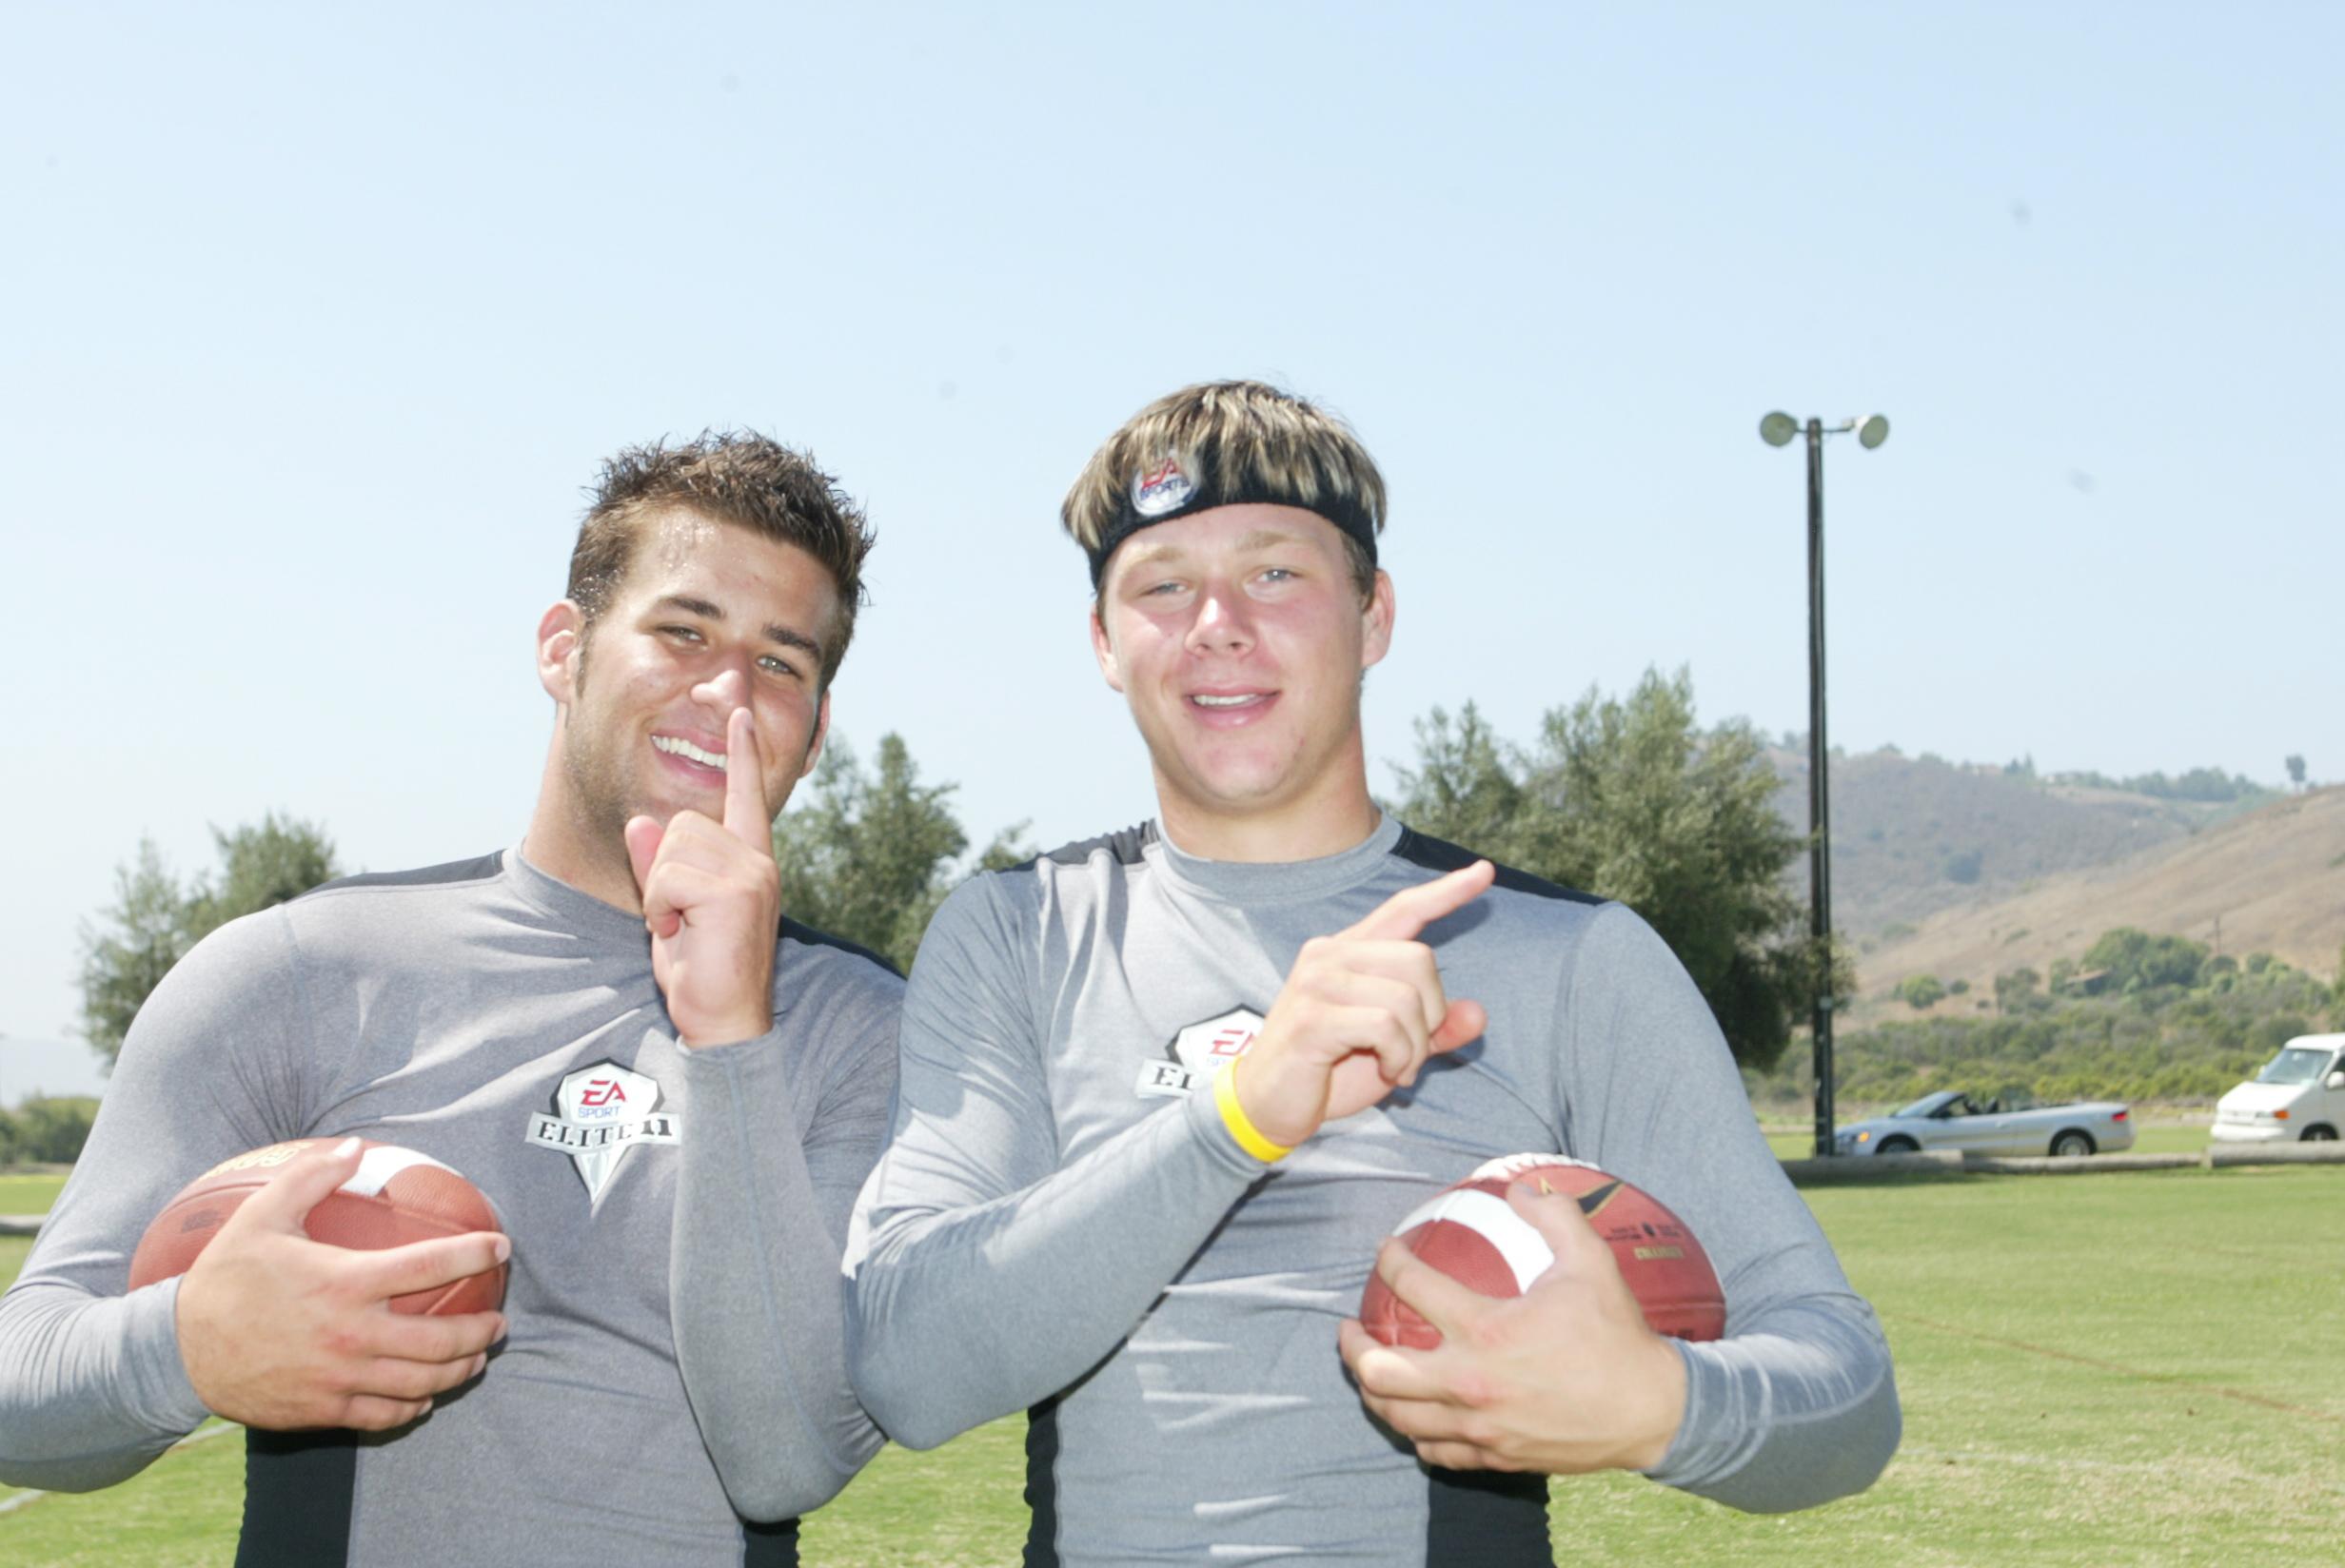 Chase Daniel & Jake Christensen